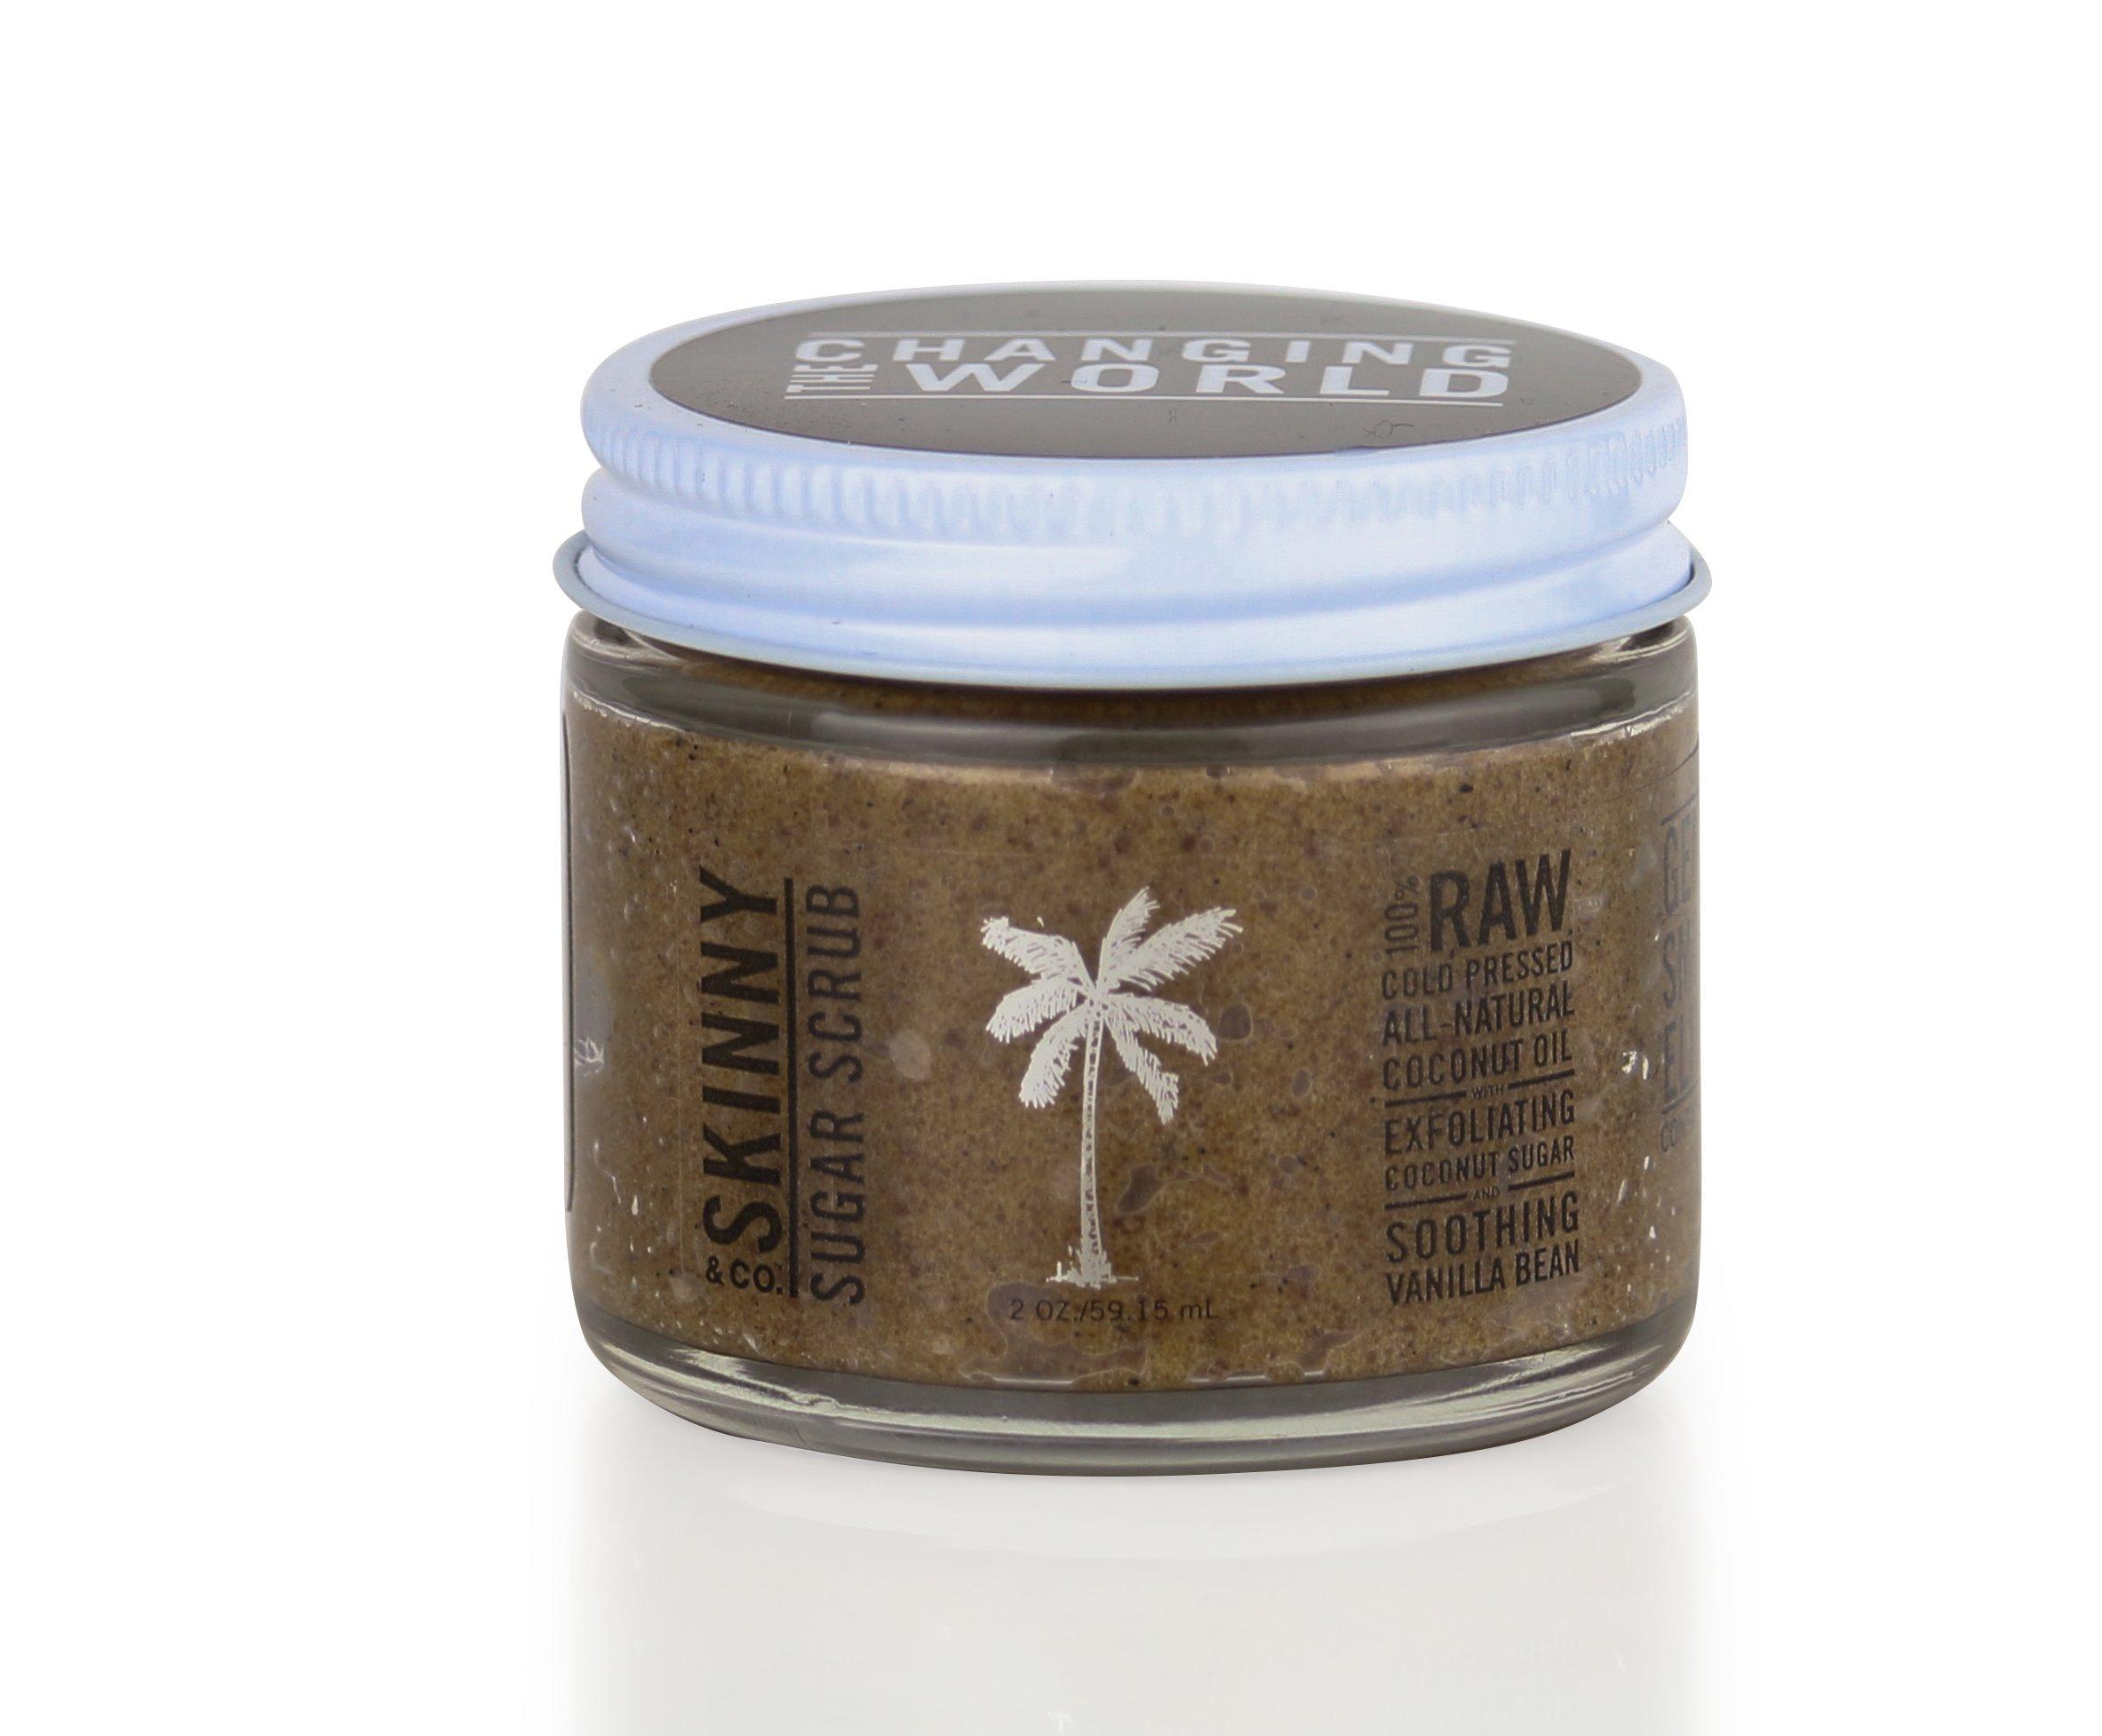 Skinny & Co. Sugar Scrub, Hydrate and Exfoliate Skin, All Natural with Coconut Oil and Vanilla Body Scrub (2 oz.)